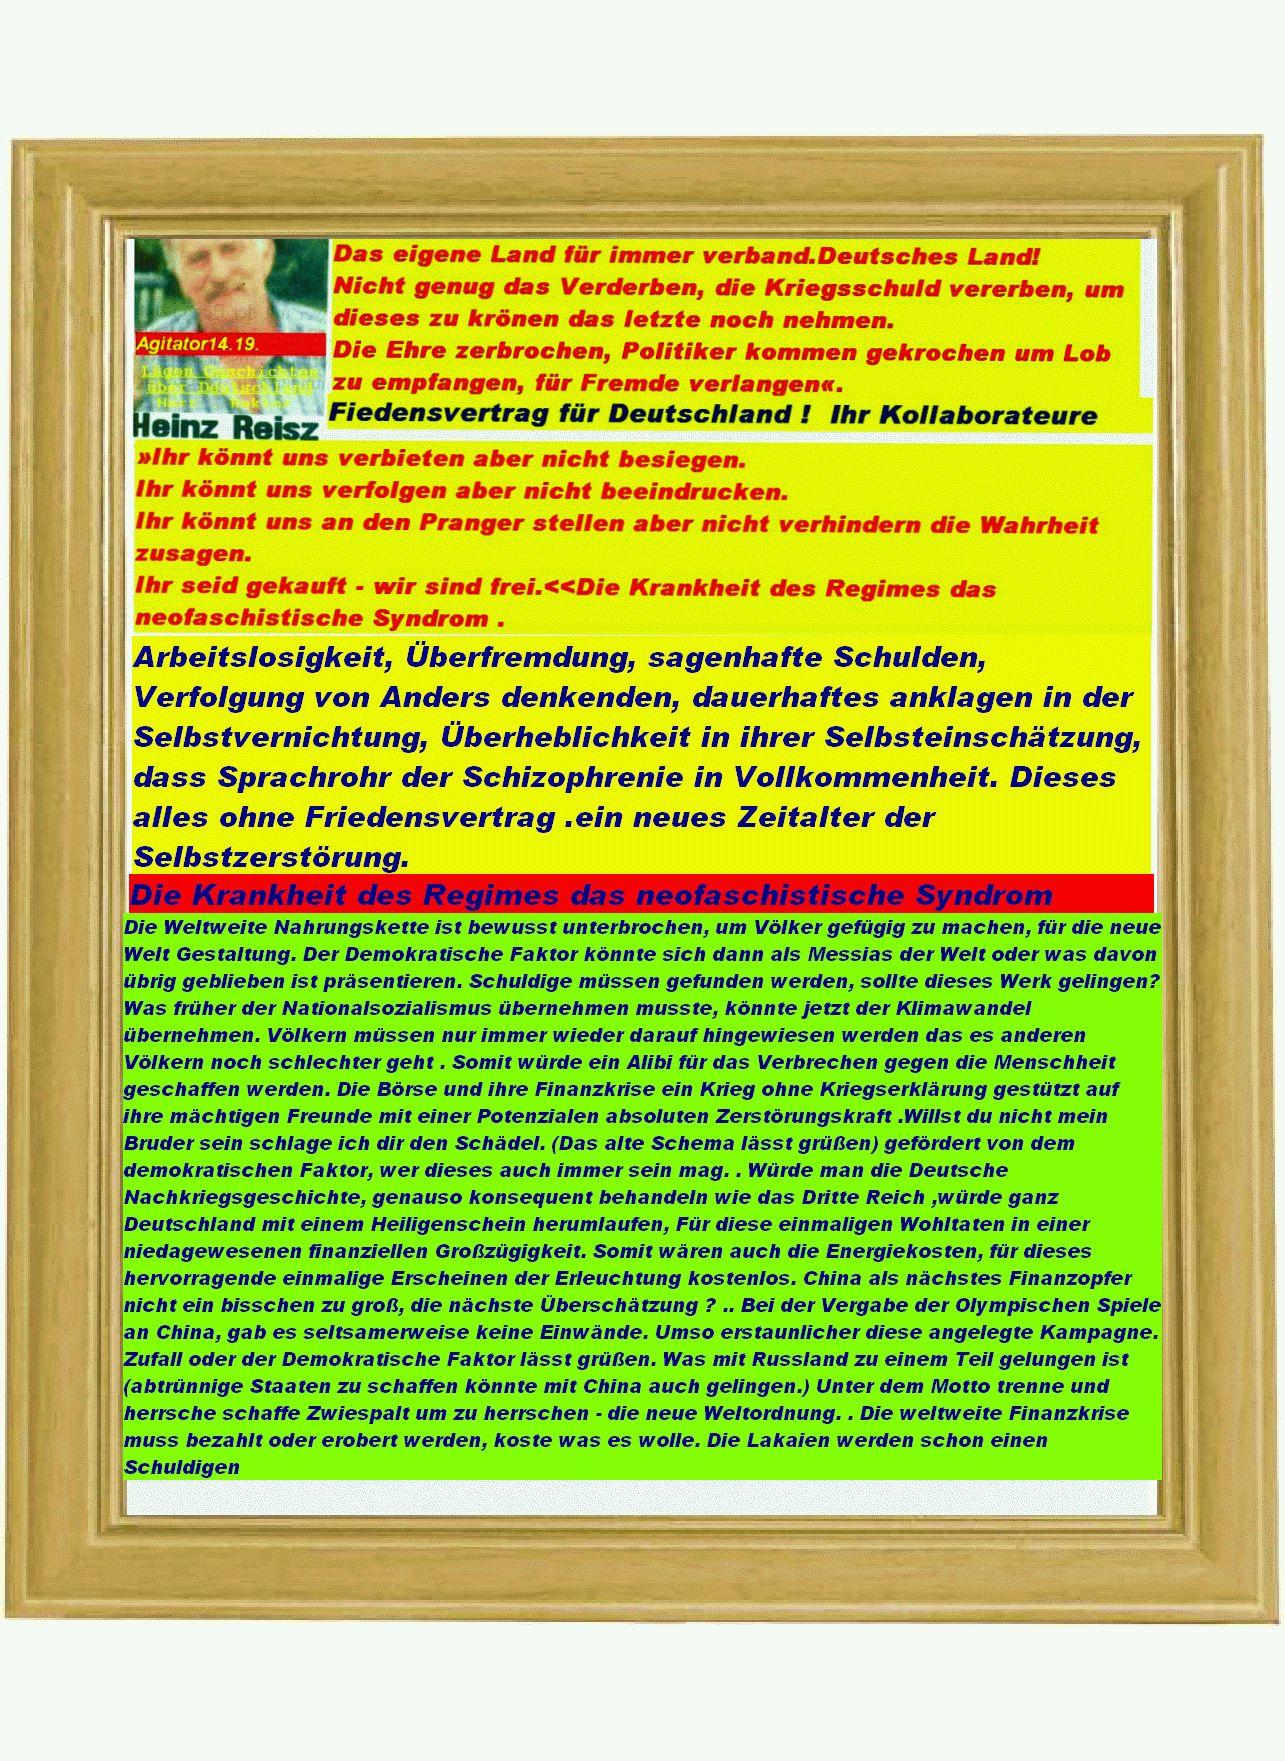 grusskarten2008.09.2312.16.25gifheinzreiszagitator14.19schriftzitatschriftspgeljpgneu.jpg